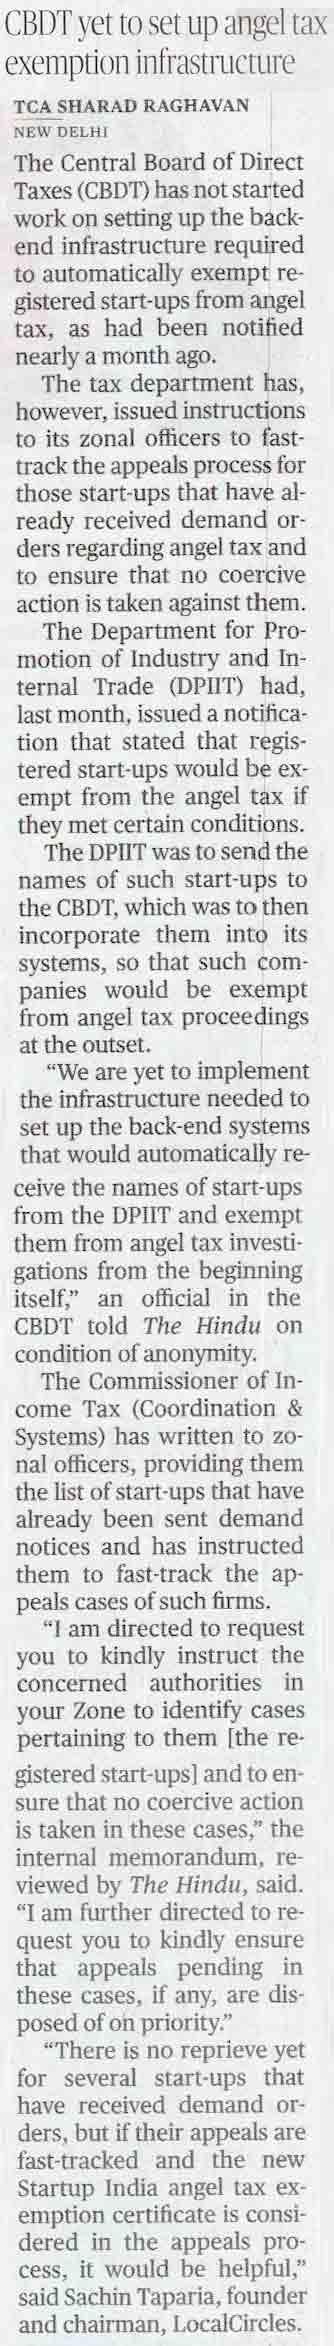 CBDT yet to set up angel tax exemption infrastructure